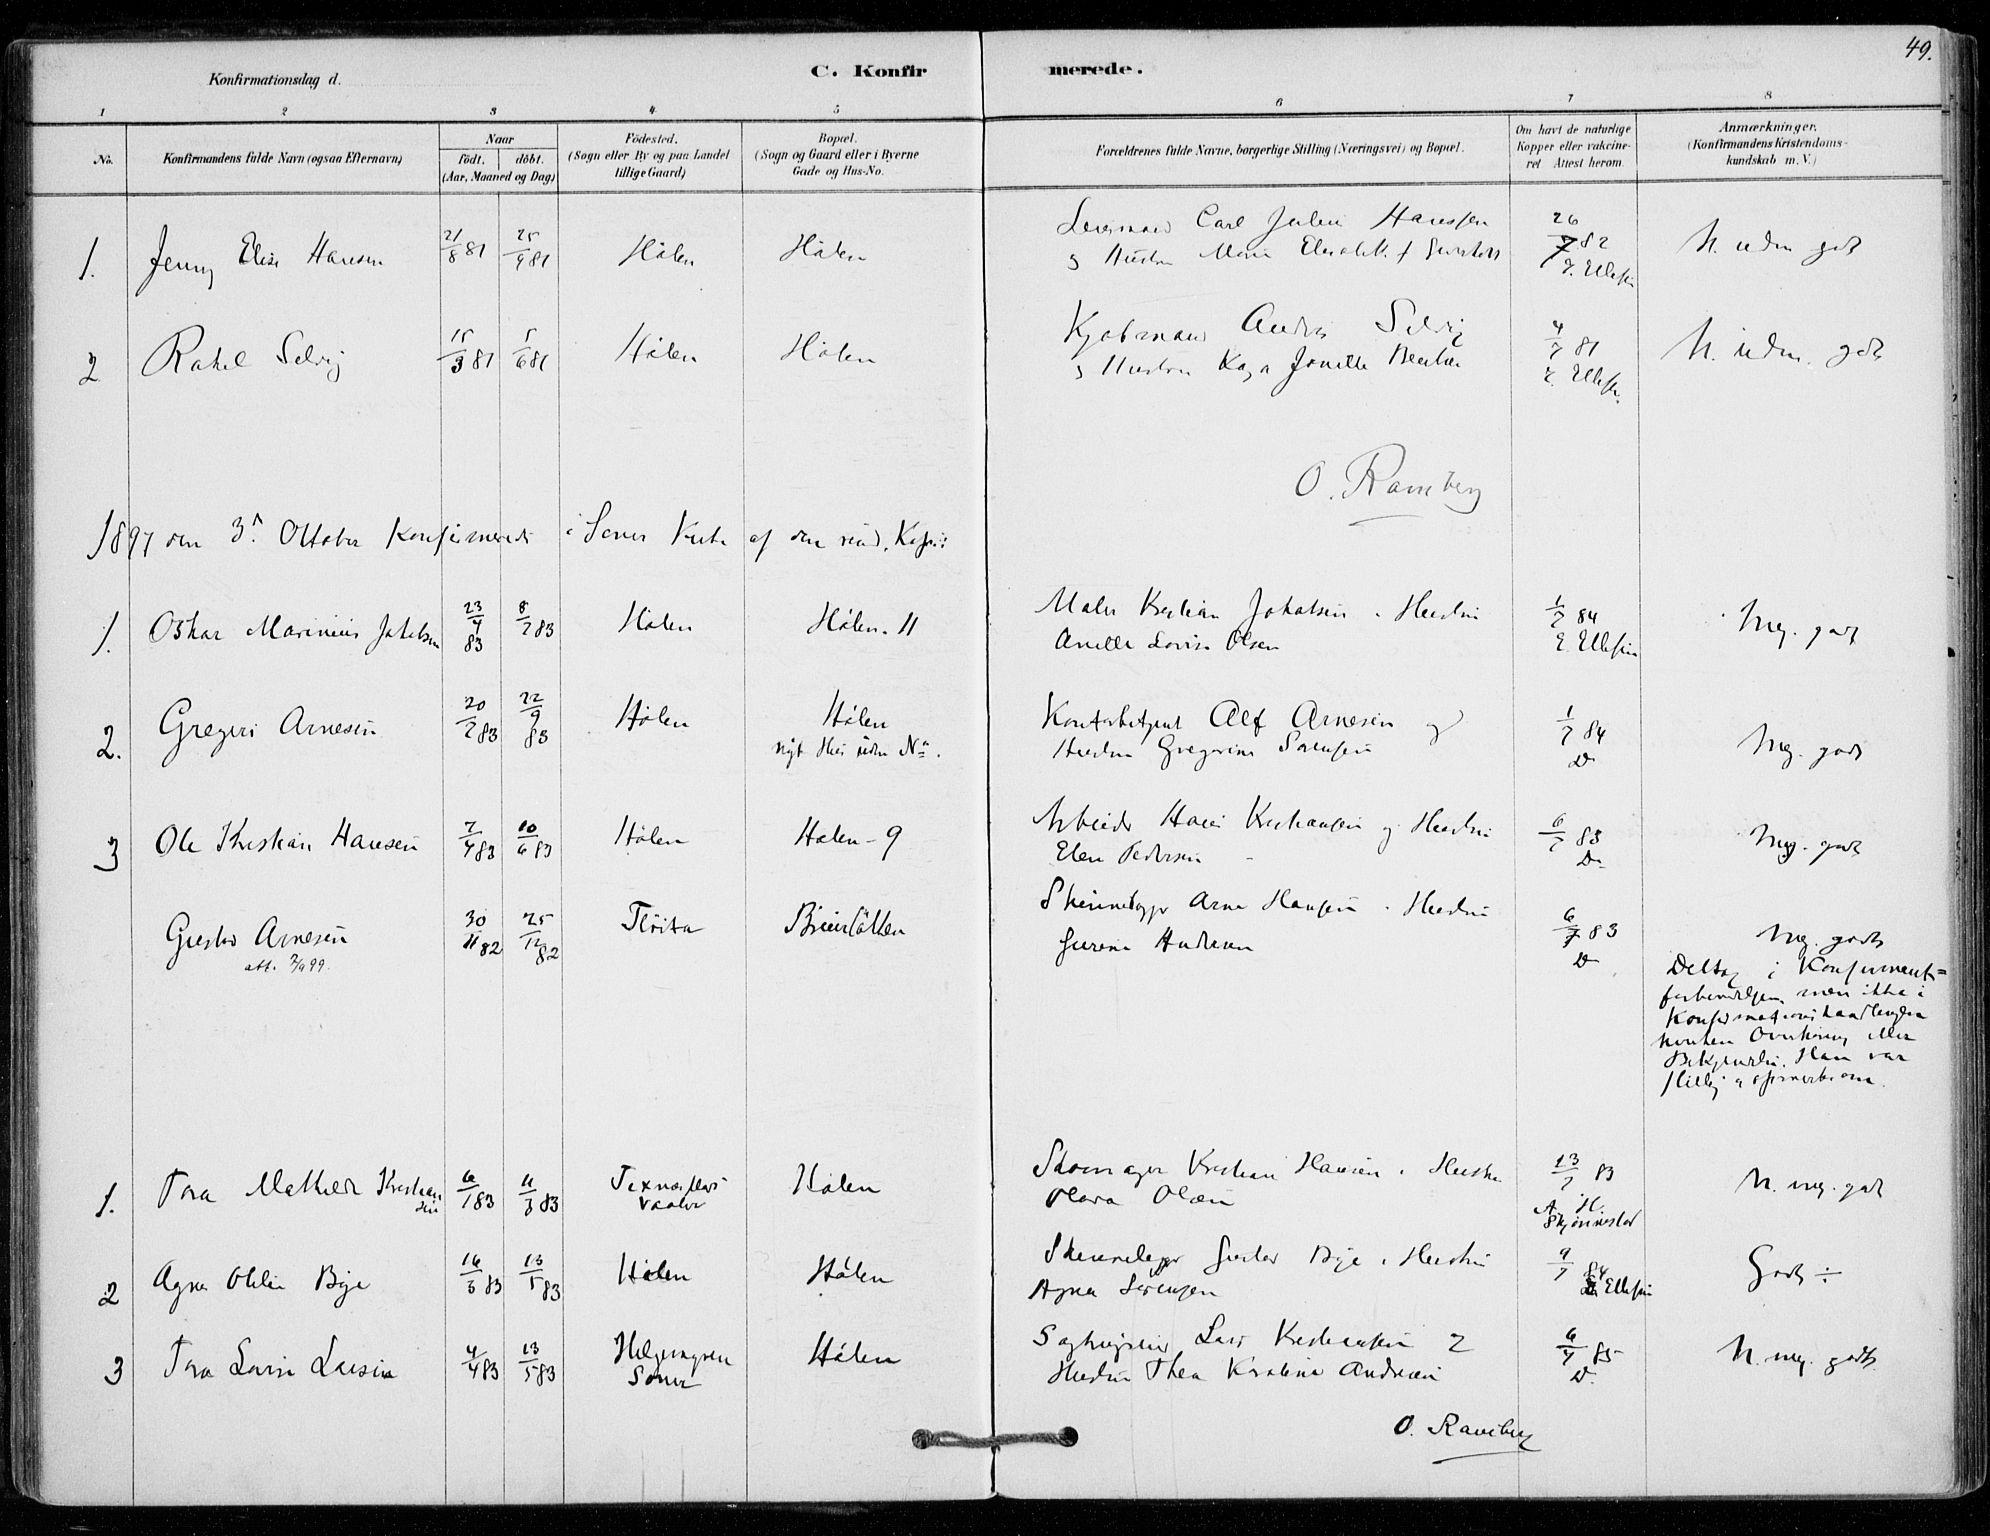 SAO, Vestby prestekontor Kirkebøker, F/Fe/L0001: Ministerialbok nr. V 1, 1878-1931, s. 49